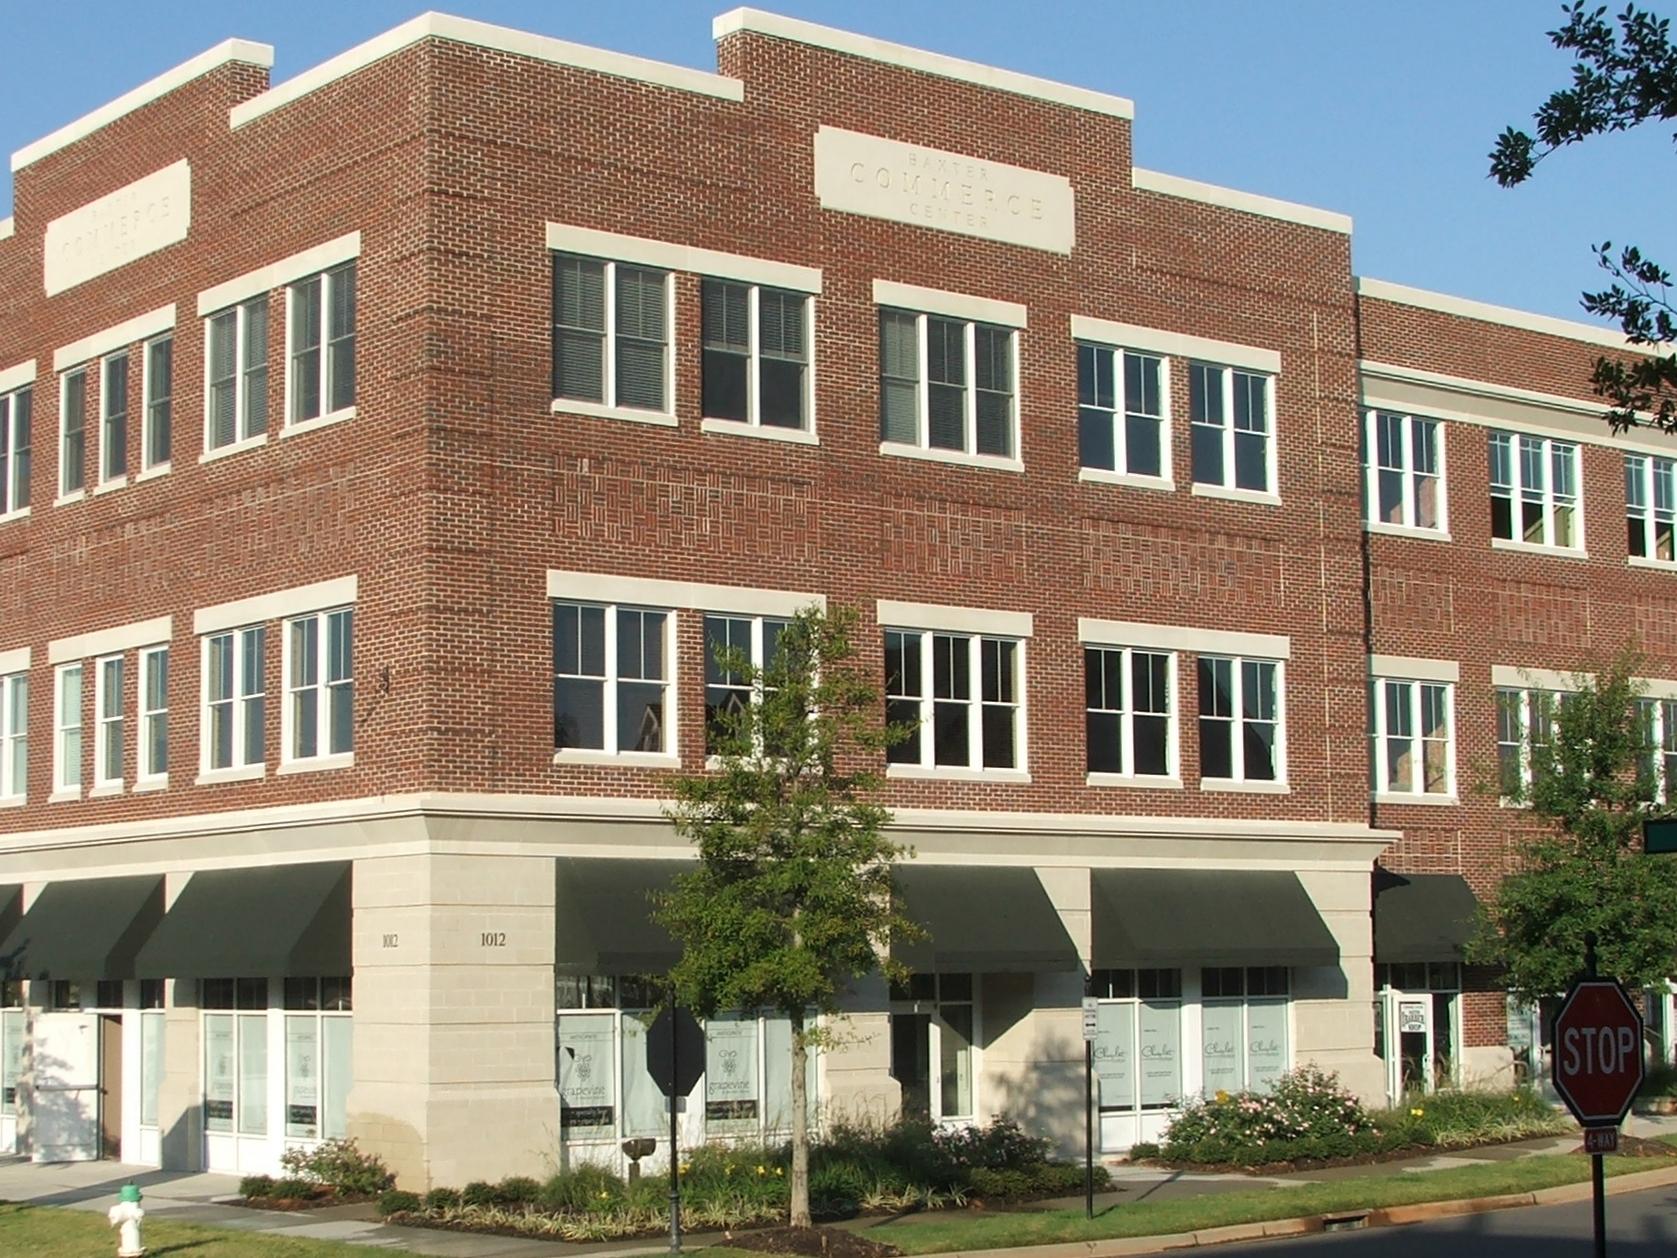 Baxter Commerce Center 07.09.26 019.jpg